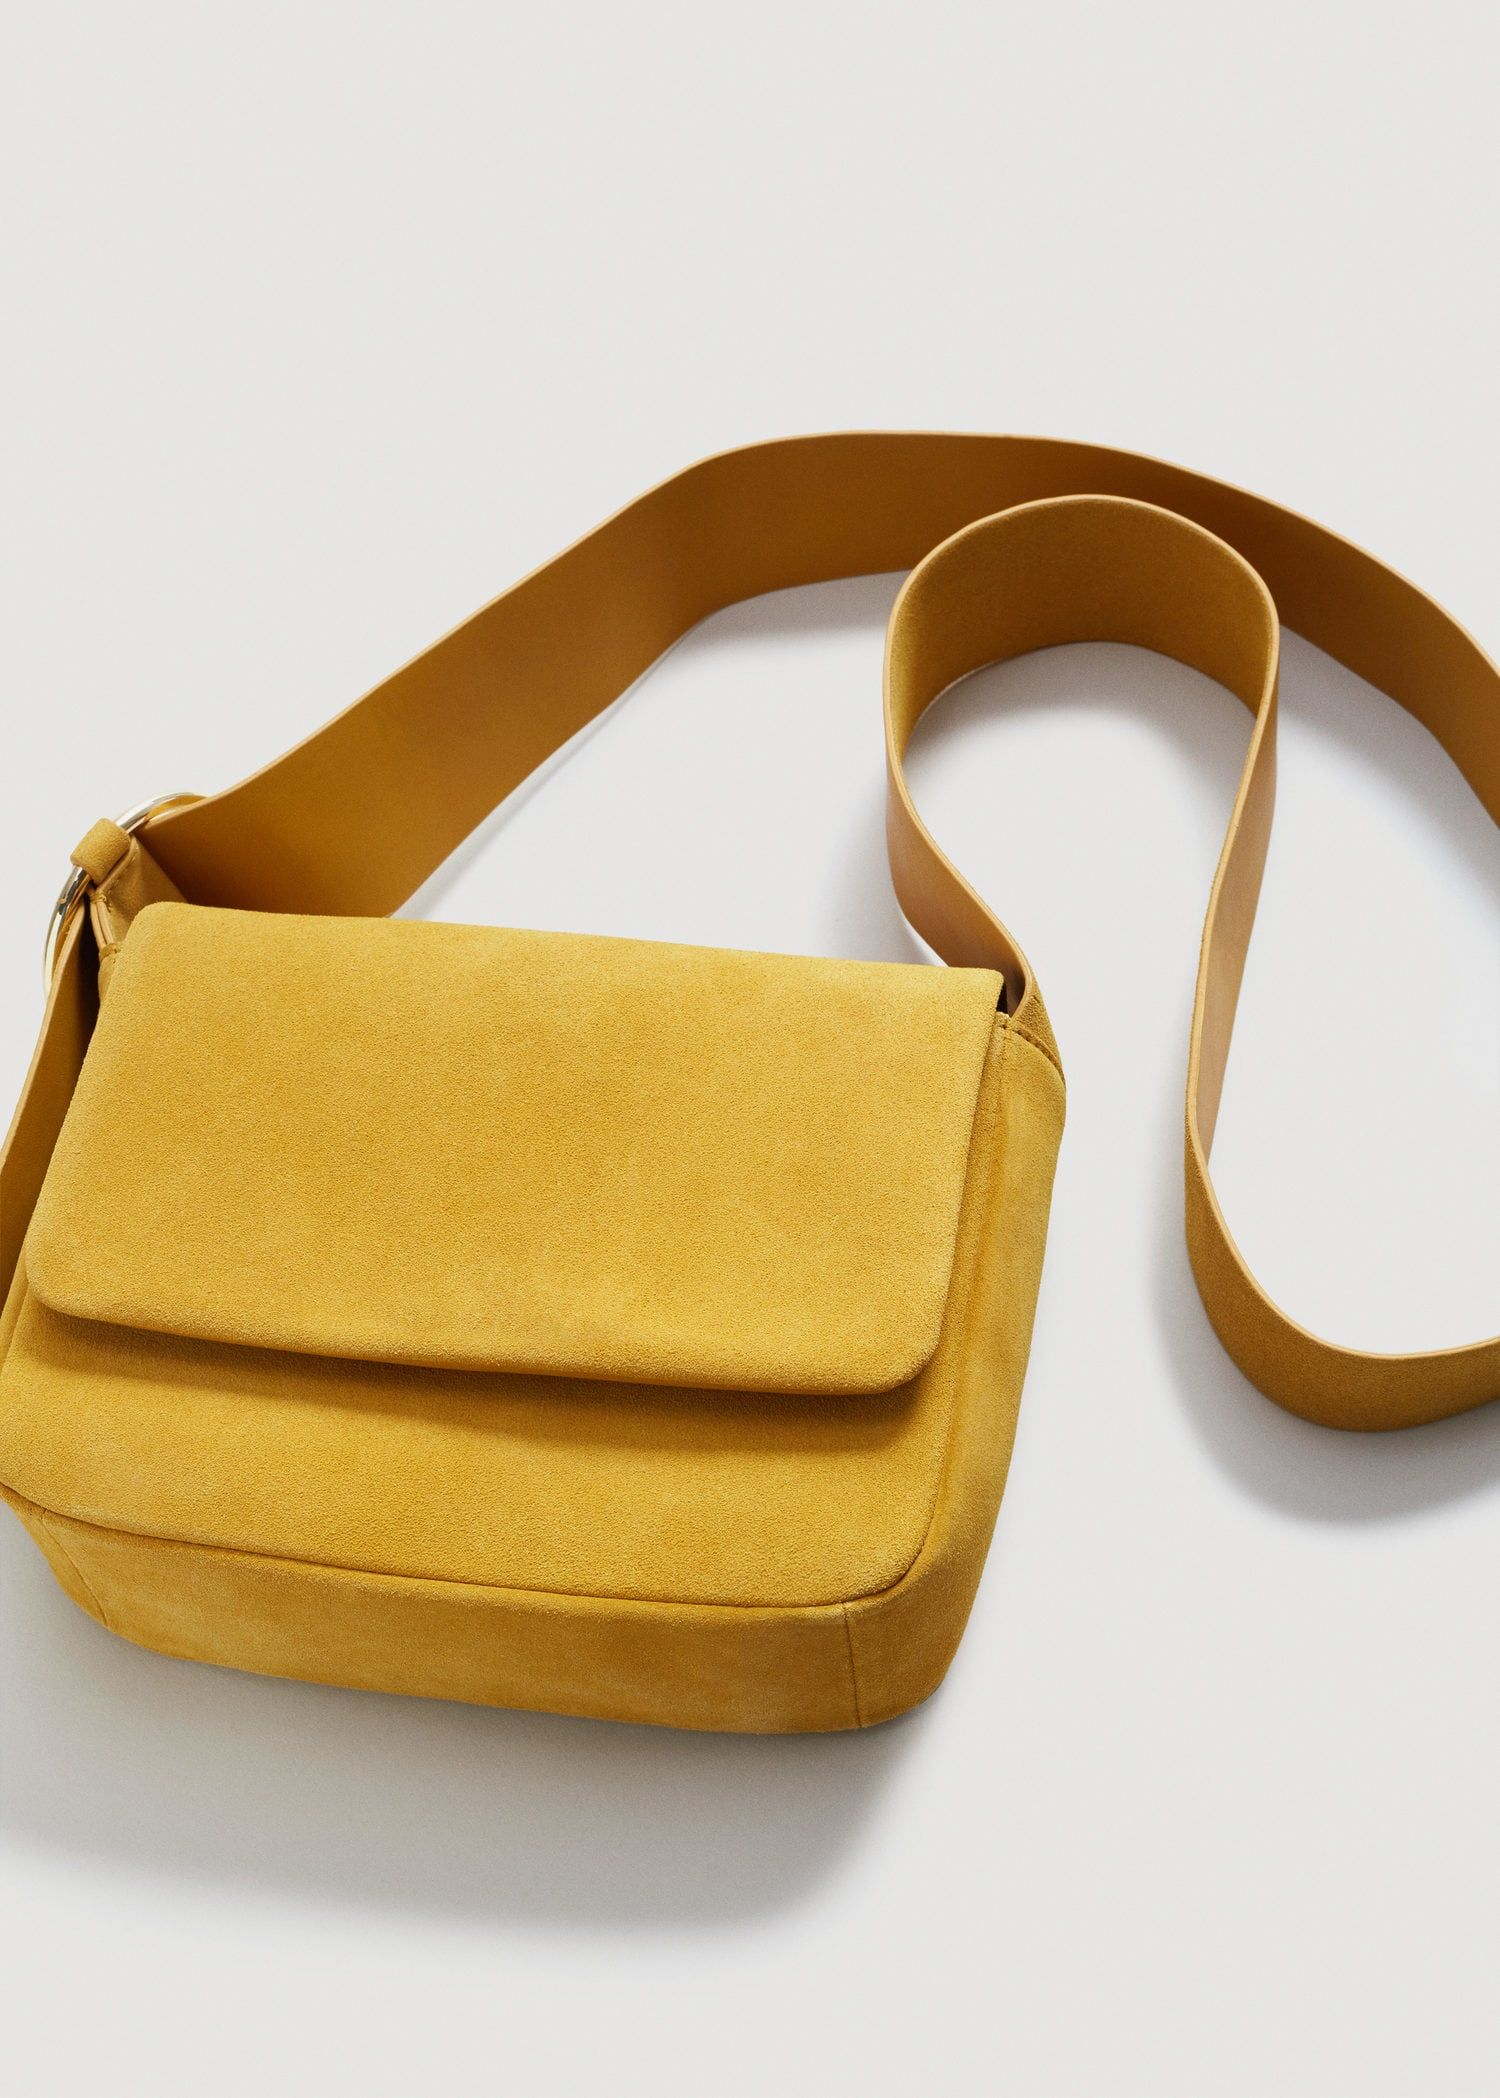 Leather Cross Body Bag In 2020 Crossbody Bag Bags